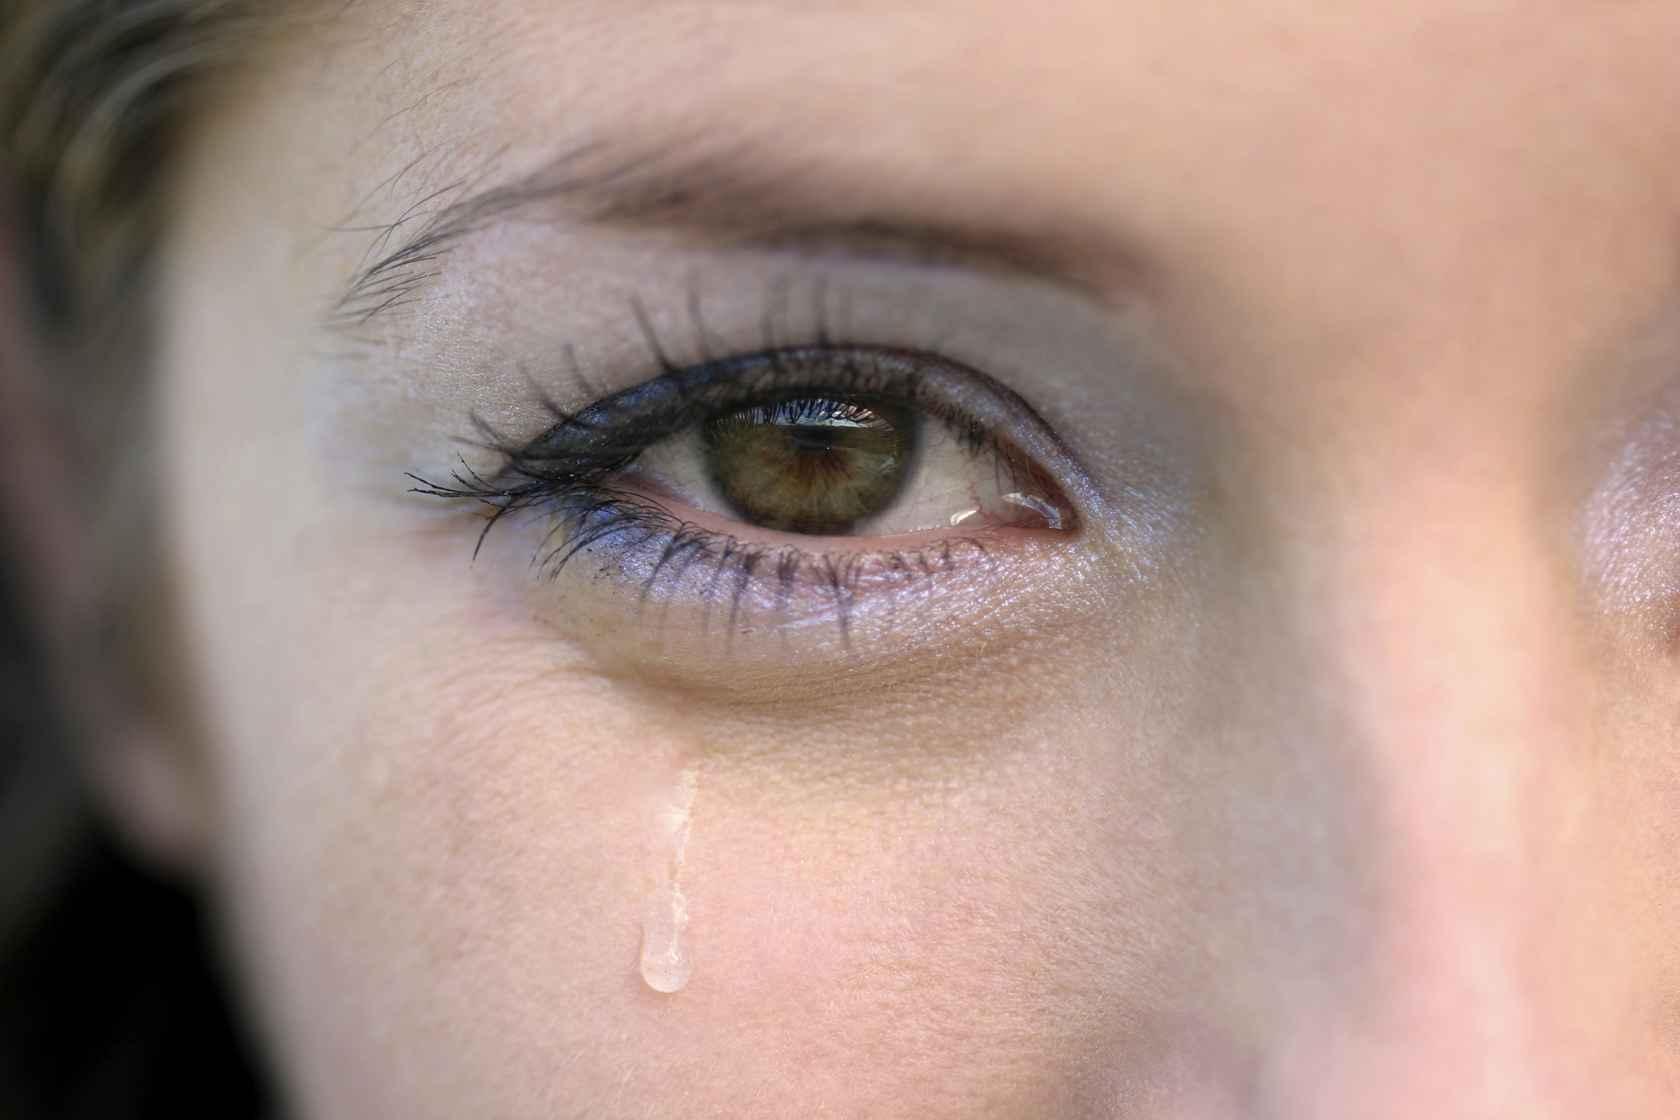 Tears-of-pleasure-000002388266_Large.jpg